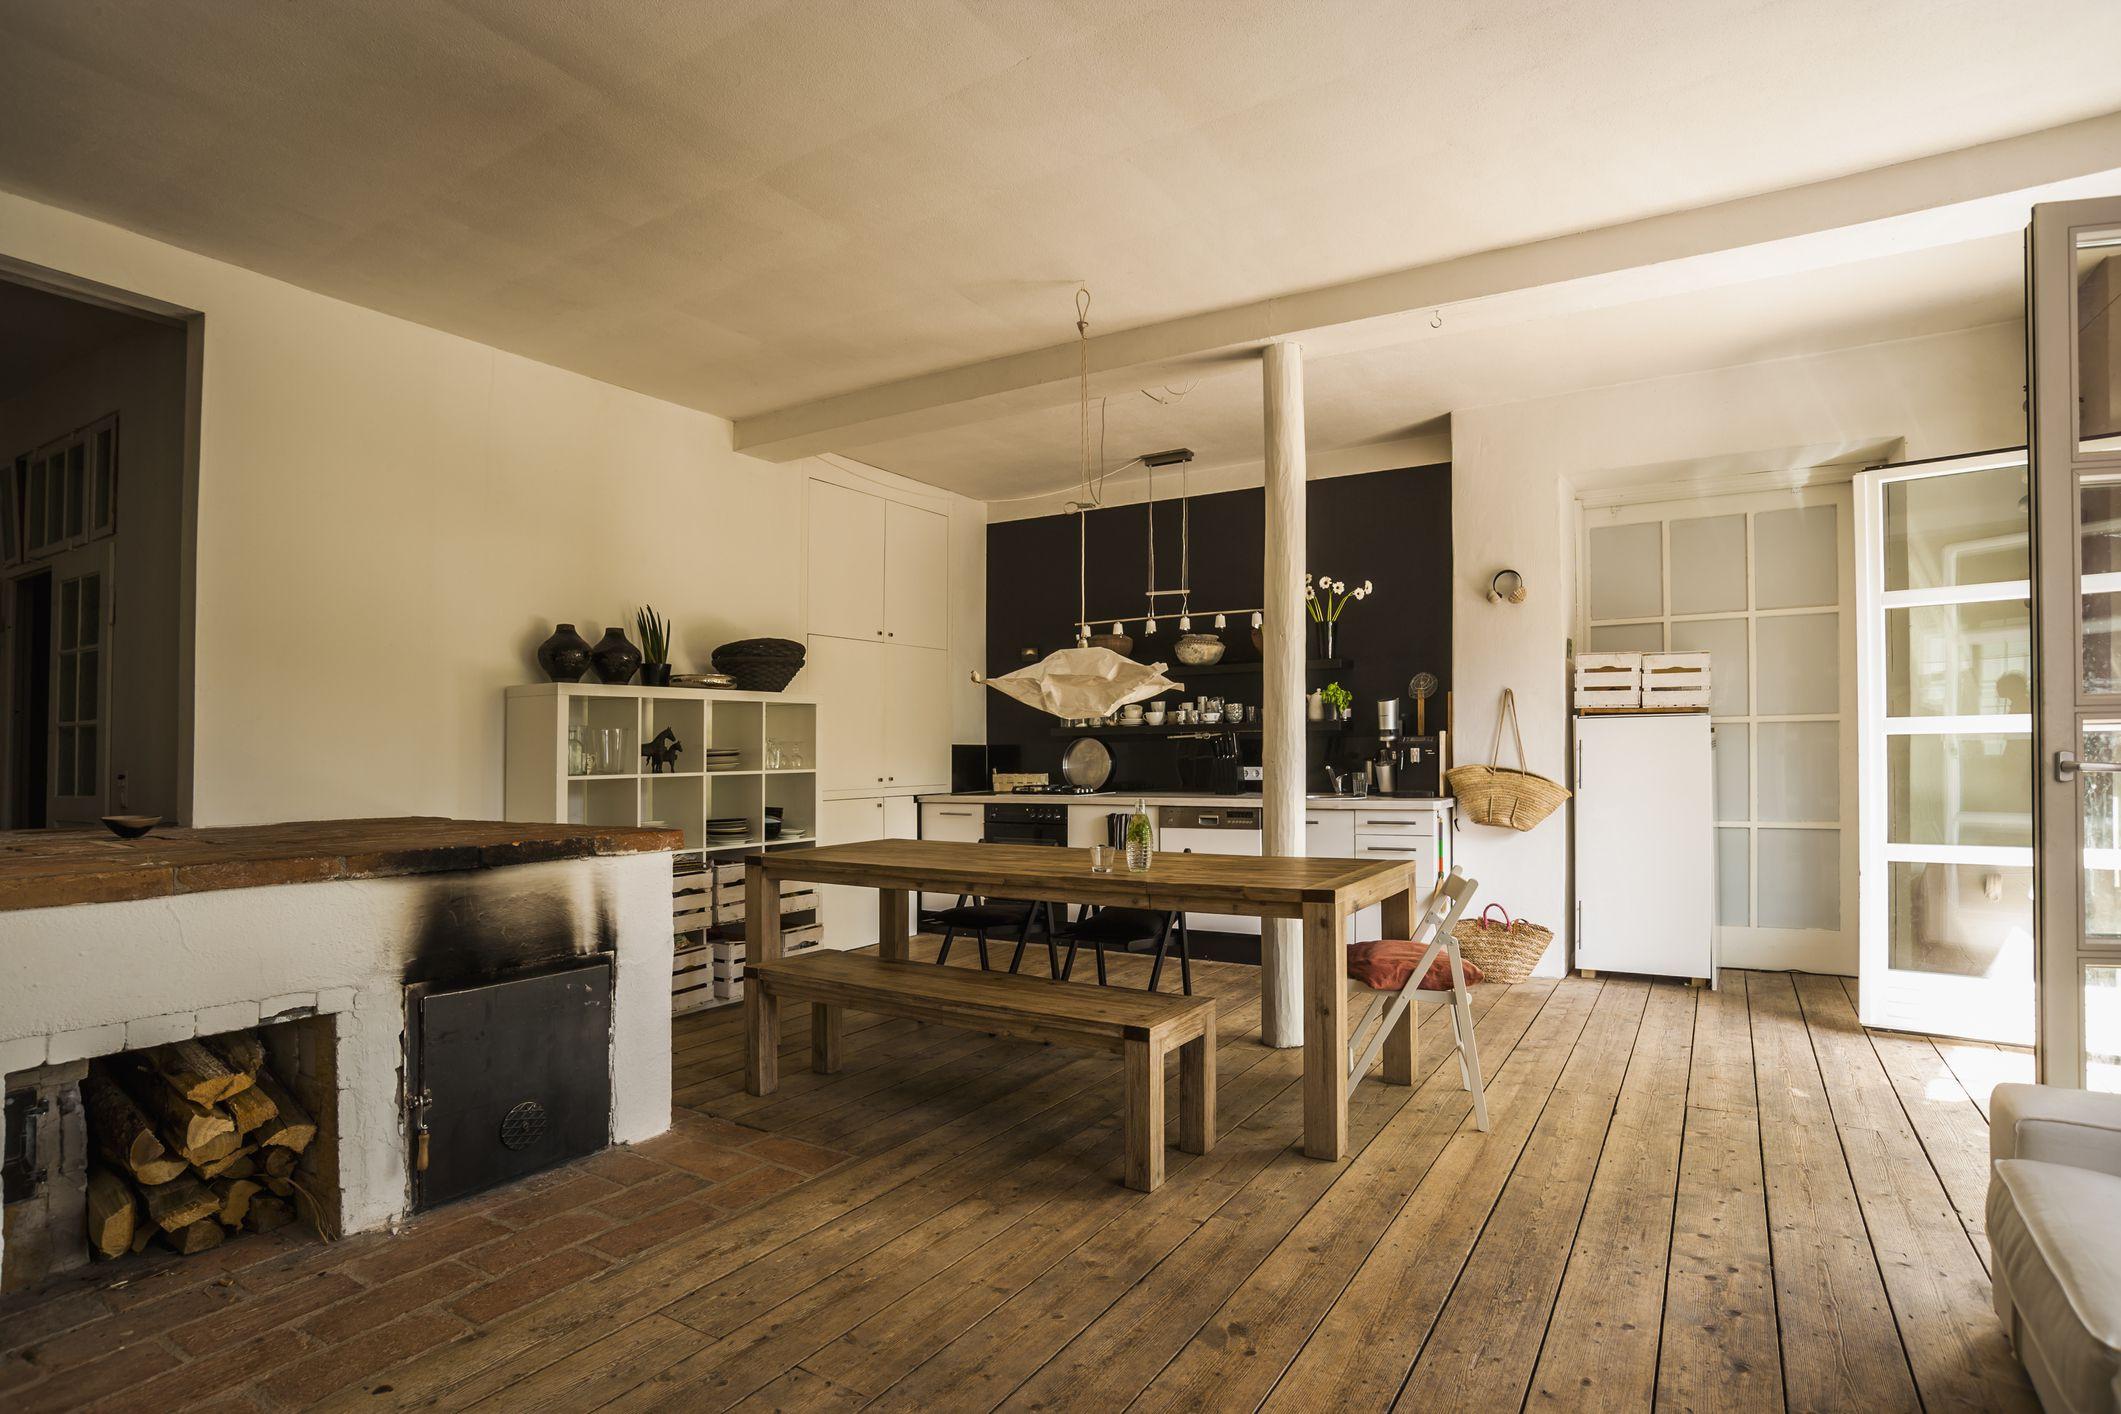 hardwood floor refinishing lynchburg va of vinyl wood flooring versus natural hardwood in diningroom woodenfloor gettyimages 544546775 590e57565f9b58647043440a